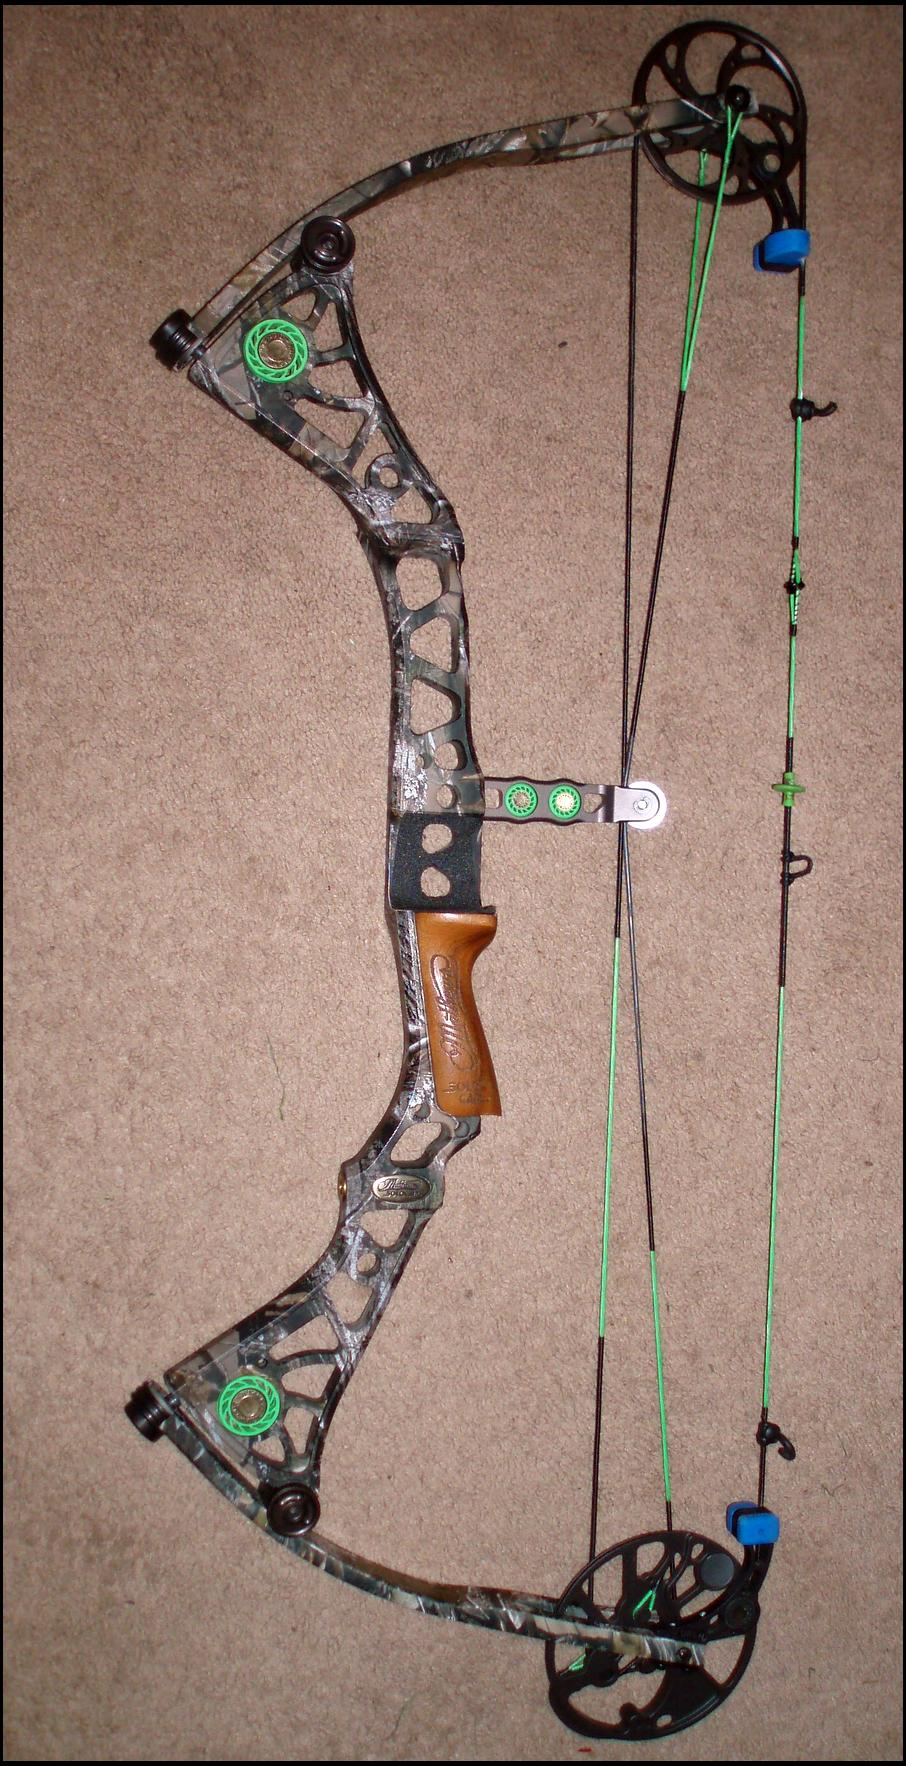 For Sale Mathews Drenalin on Bowsitecoms FREE Archery